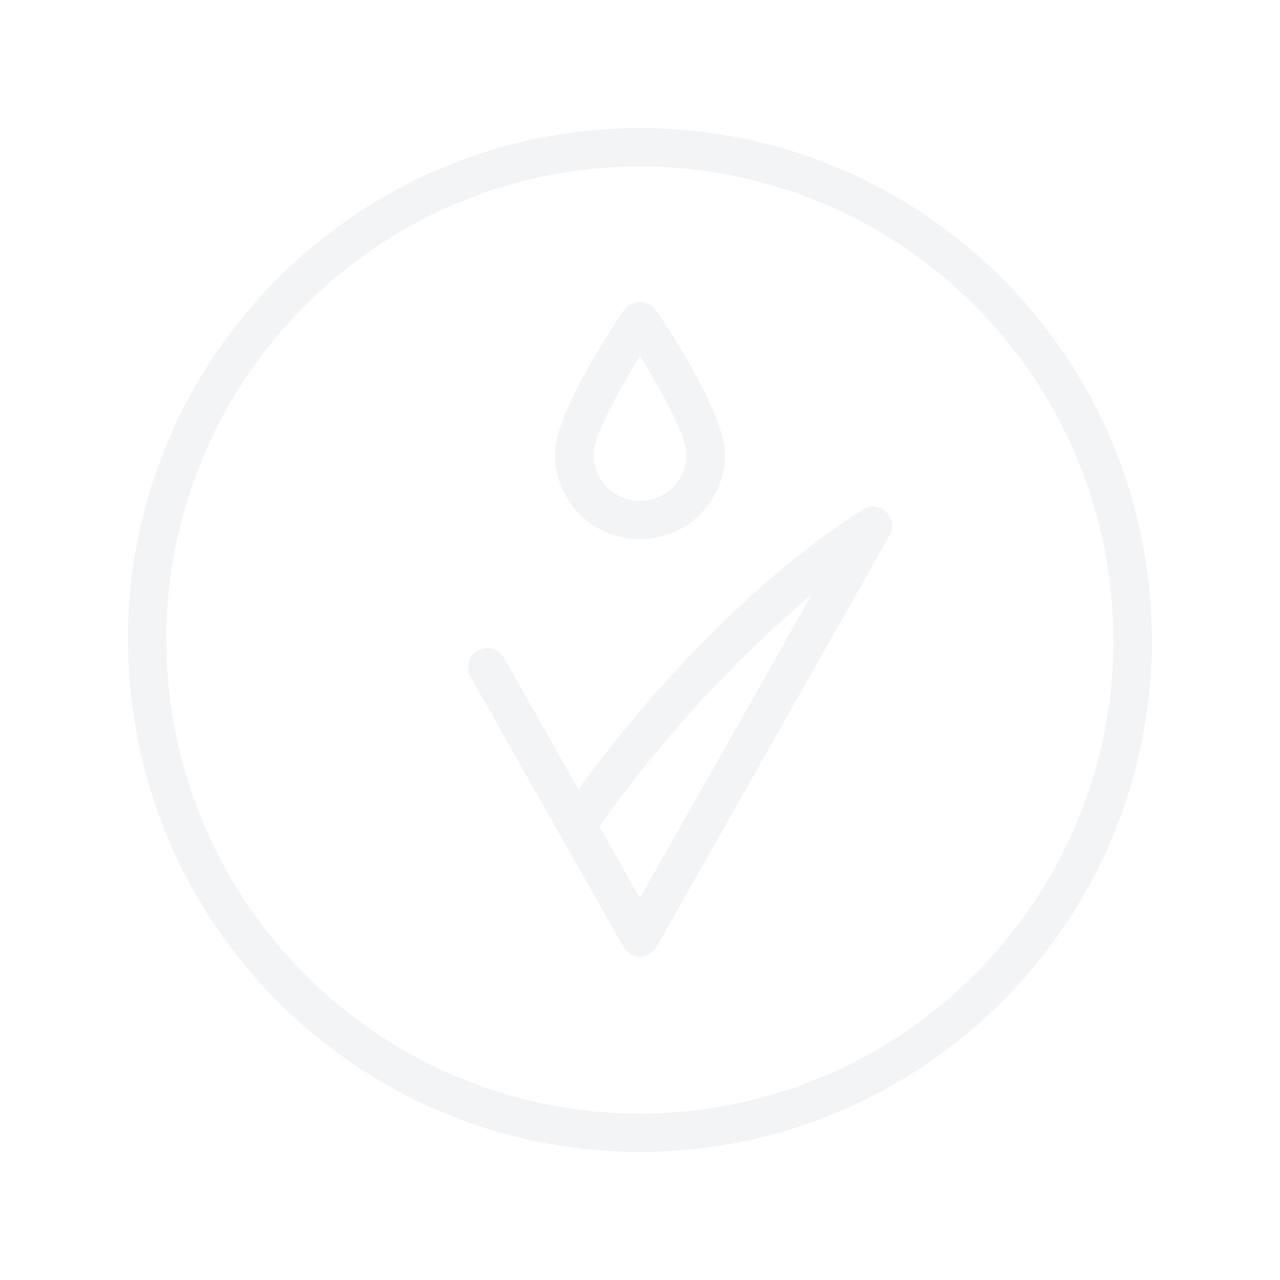 ESTEE LAUDER Perfectionist Serum Makeup SPF25 30ml